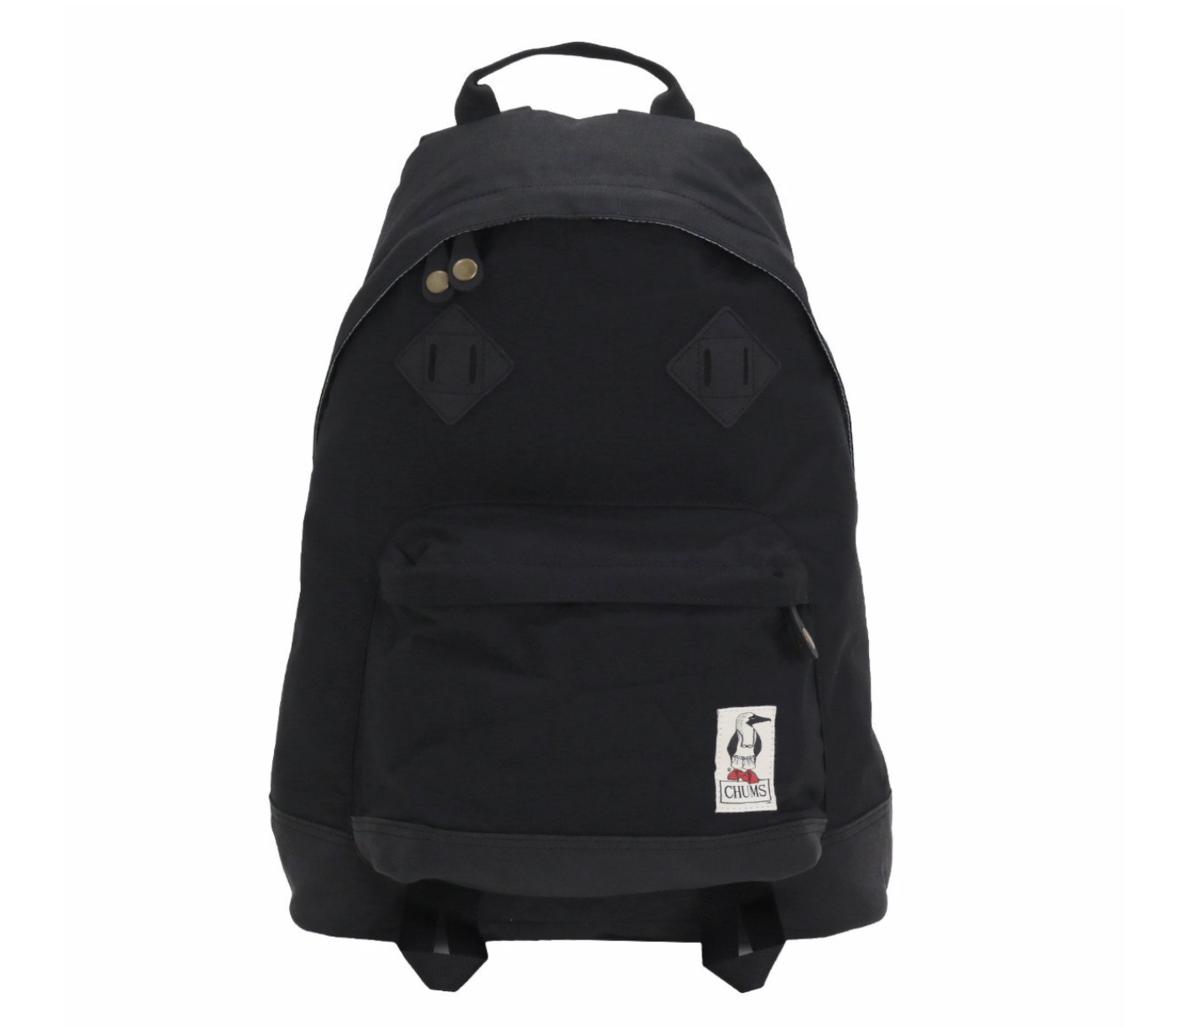 f:id:thebackpack:20190329211016p:plain